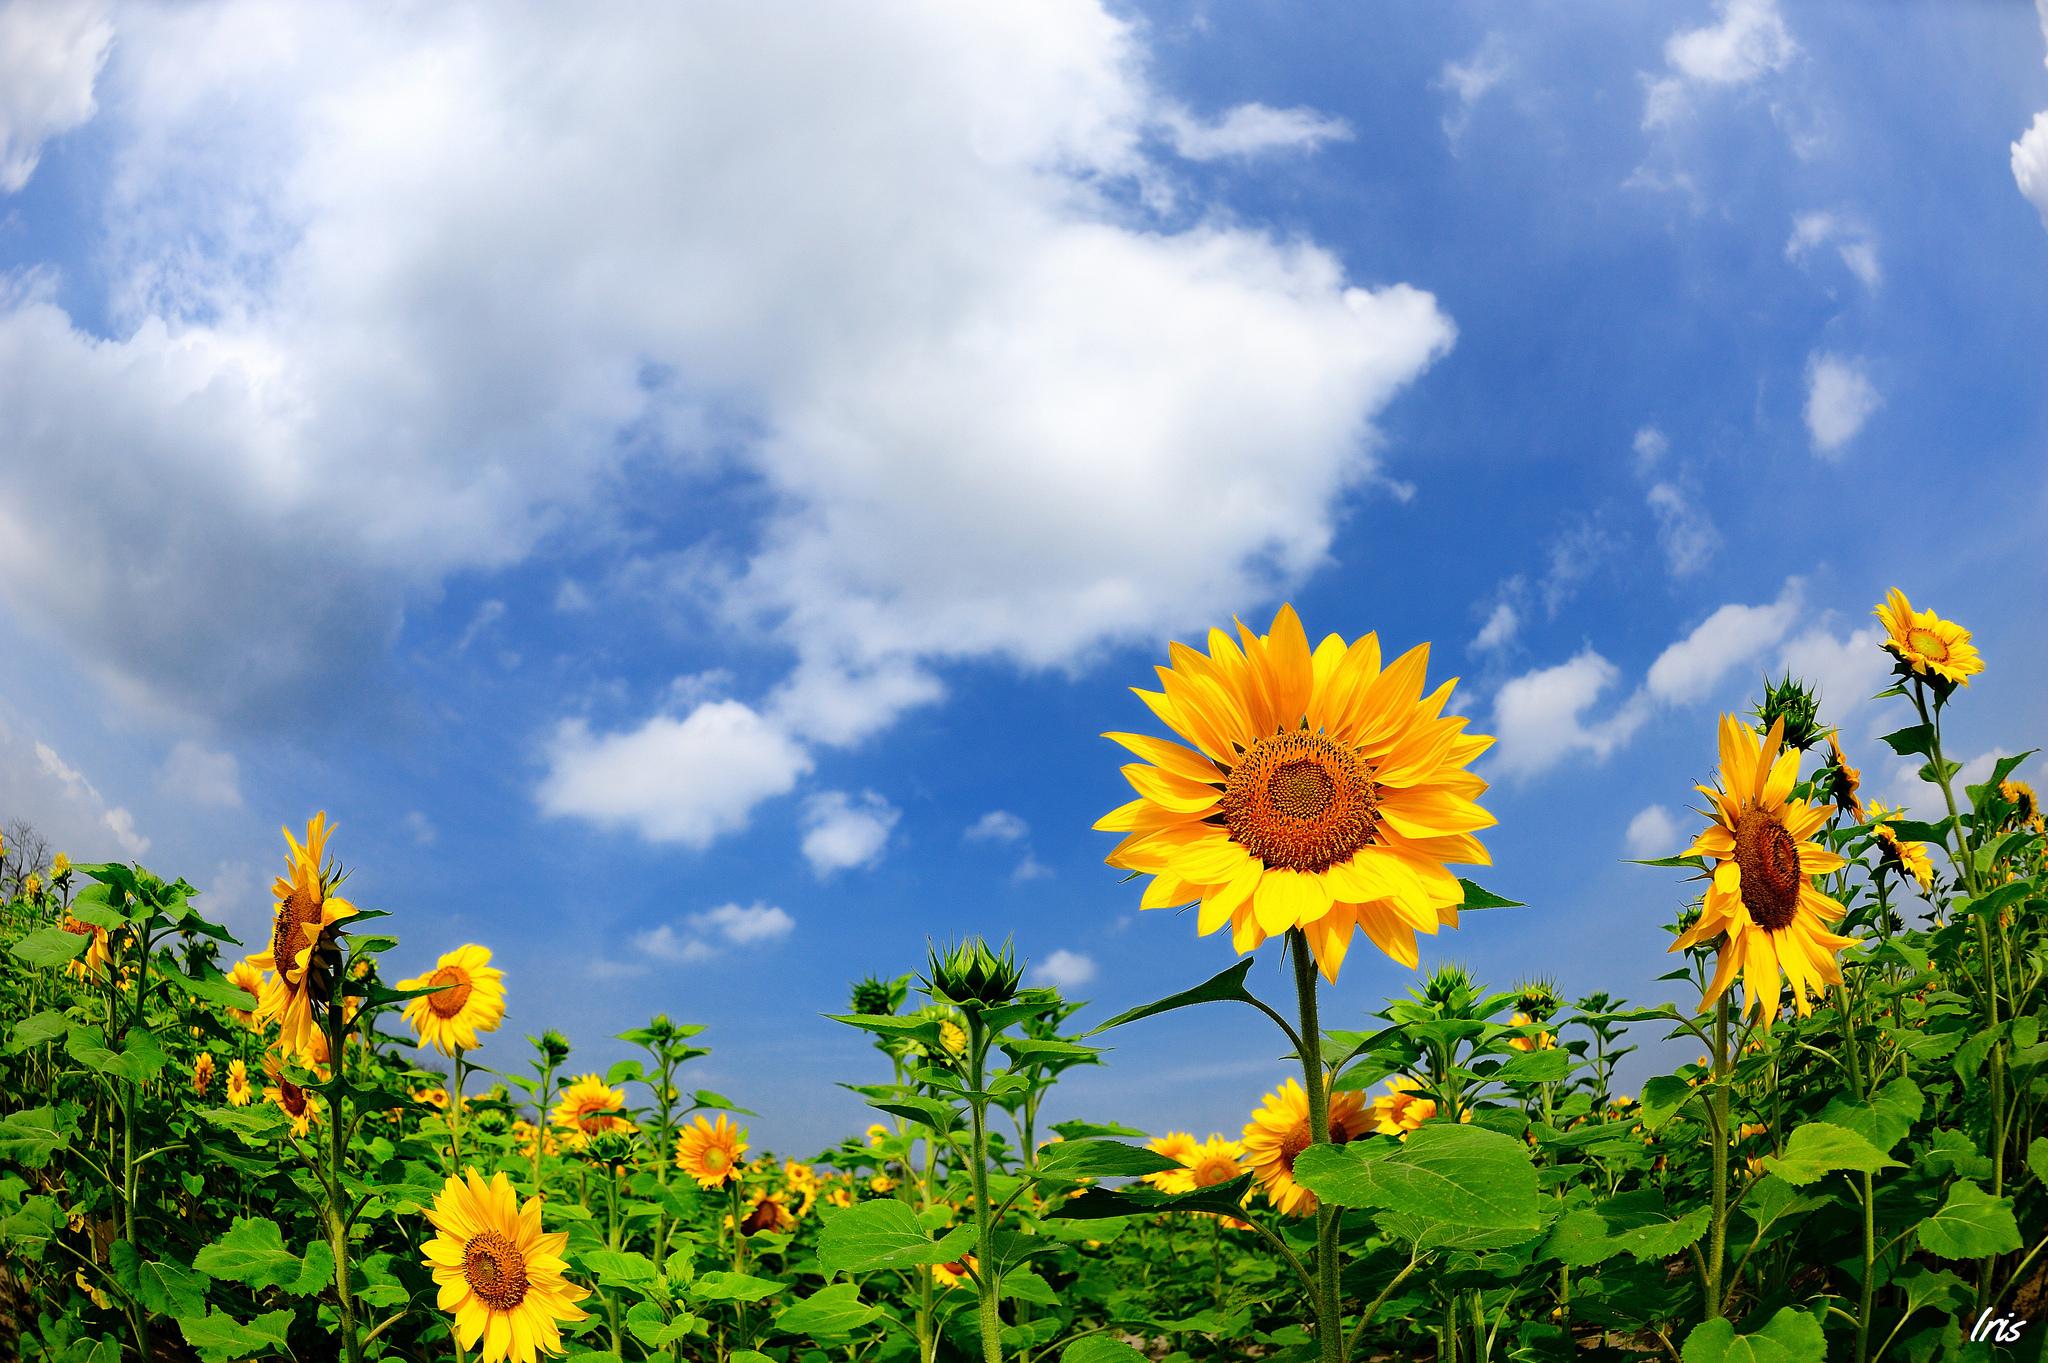 подсолнухи поле sunflowers field  № 419160 бесплатно